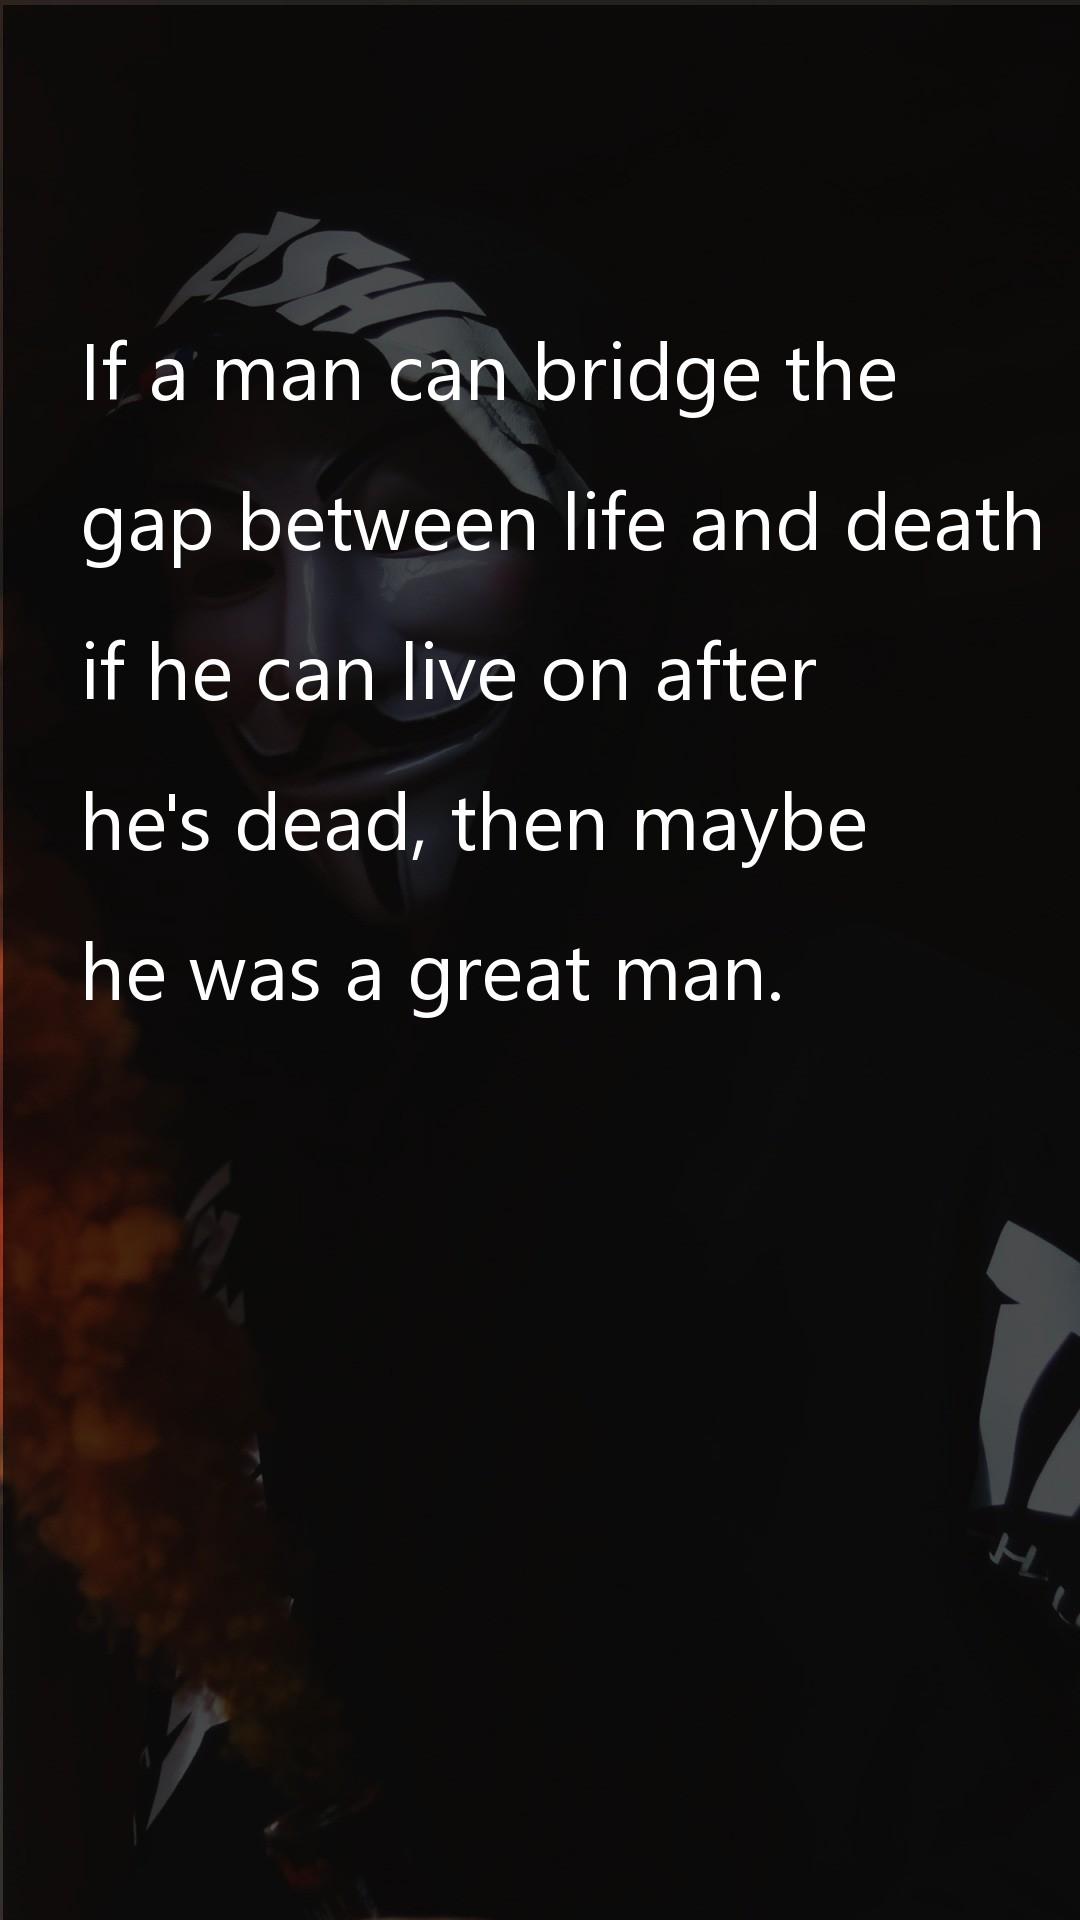 If a man can bridge the